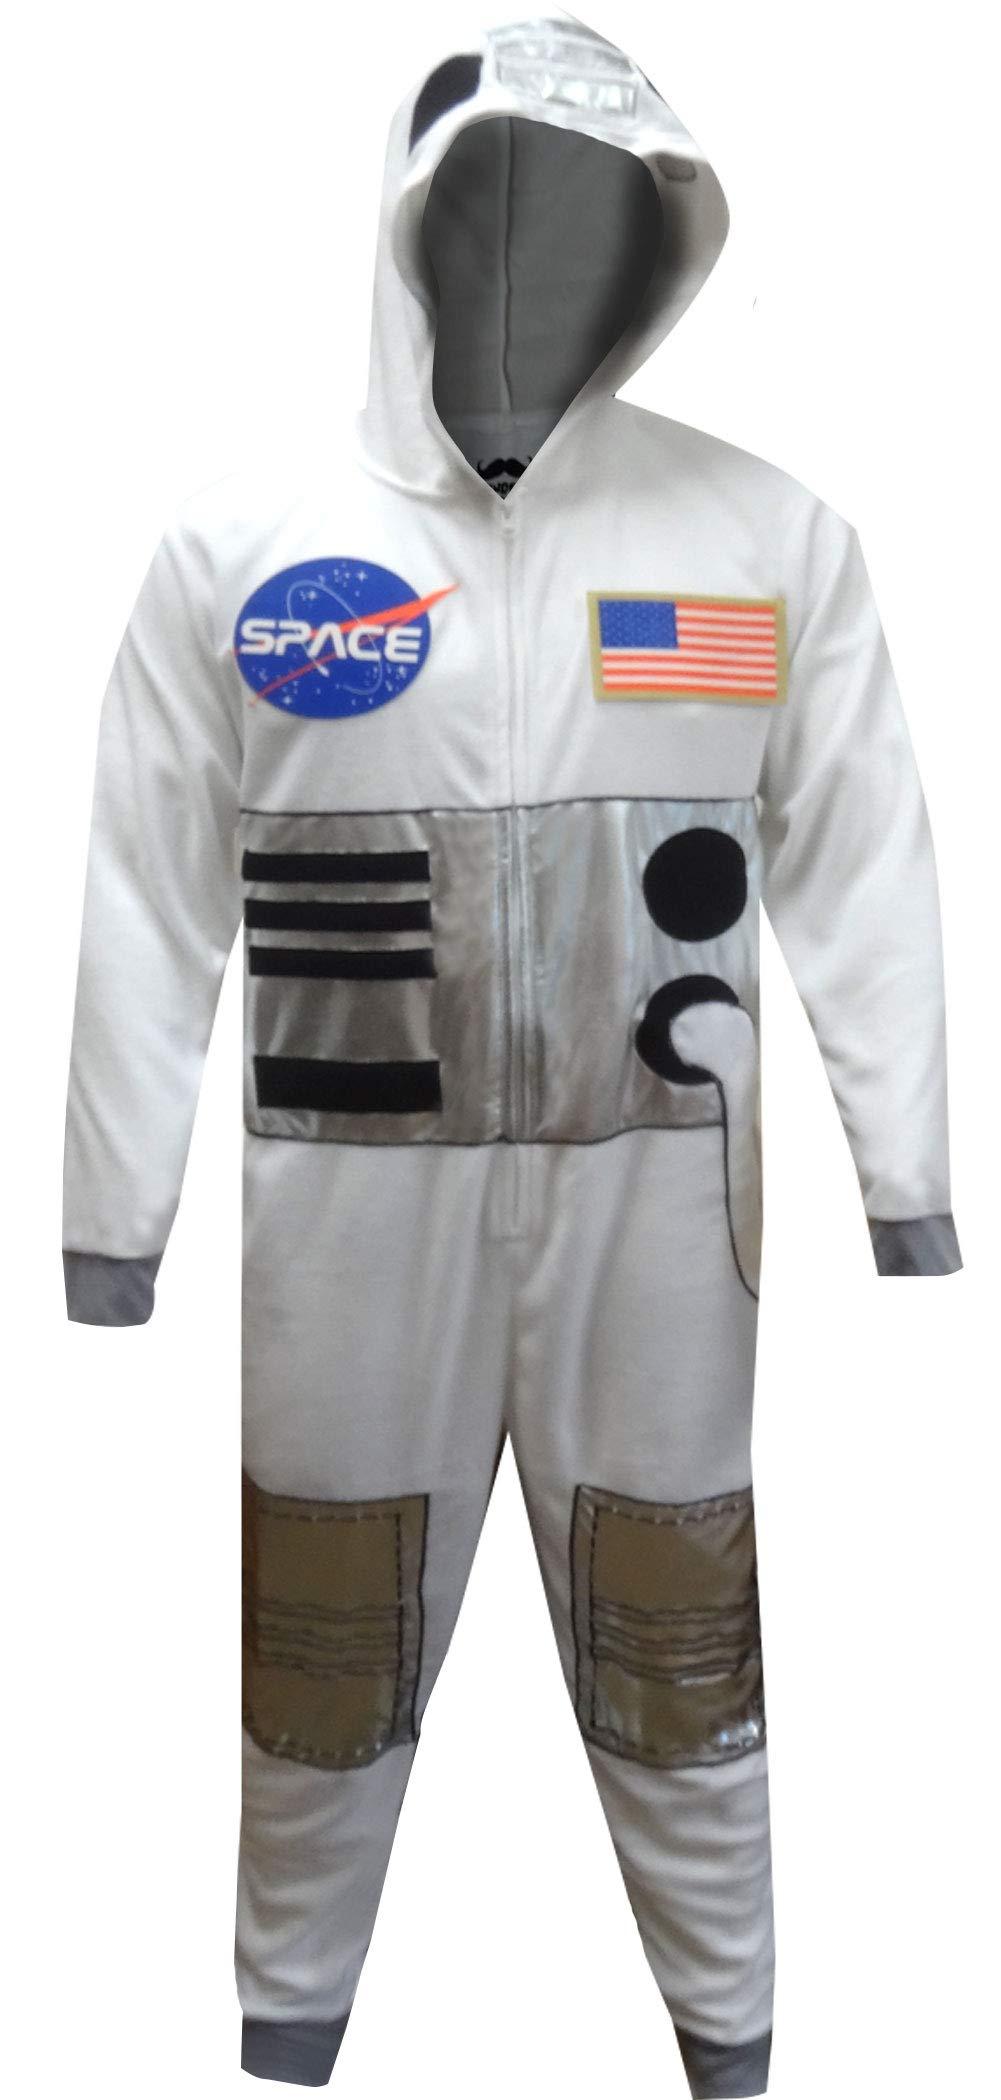 MJC Men's NASA Space Suit Be an Astronaut Onesie Pajamas (2XL/3XL) White